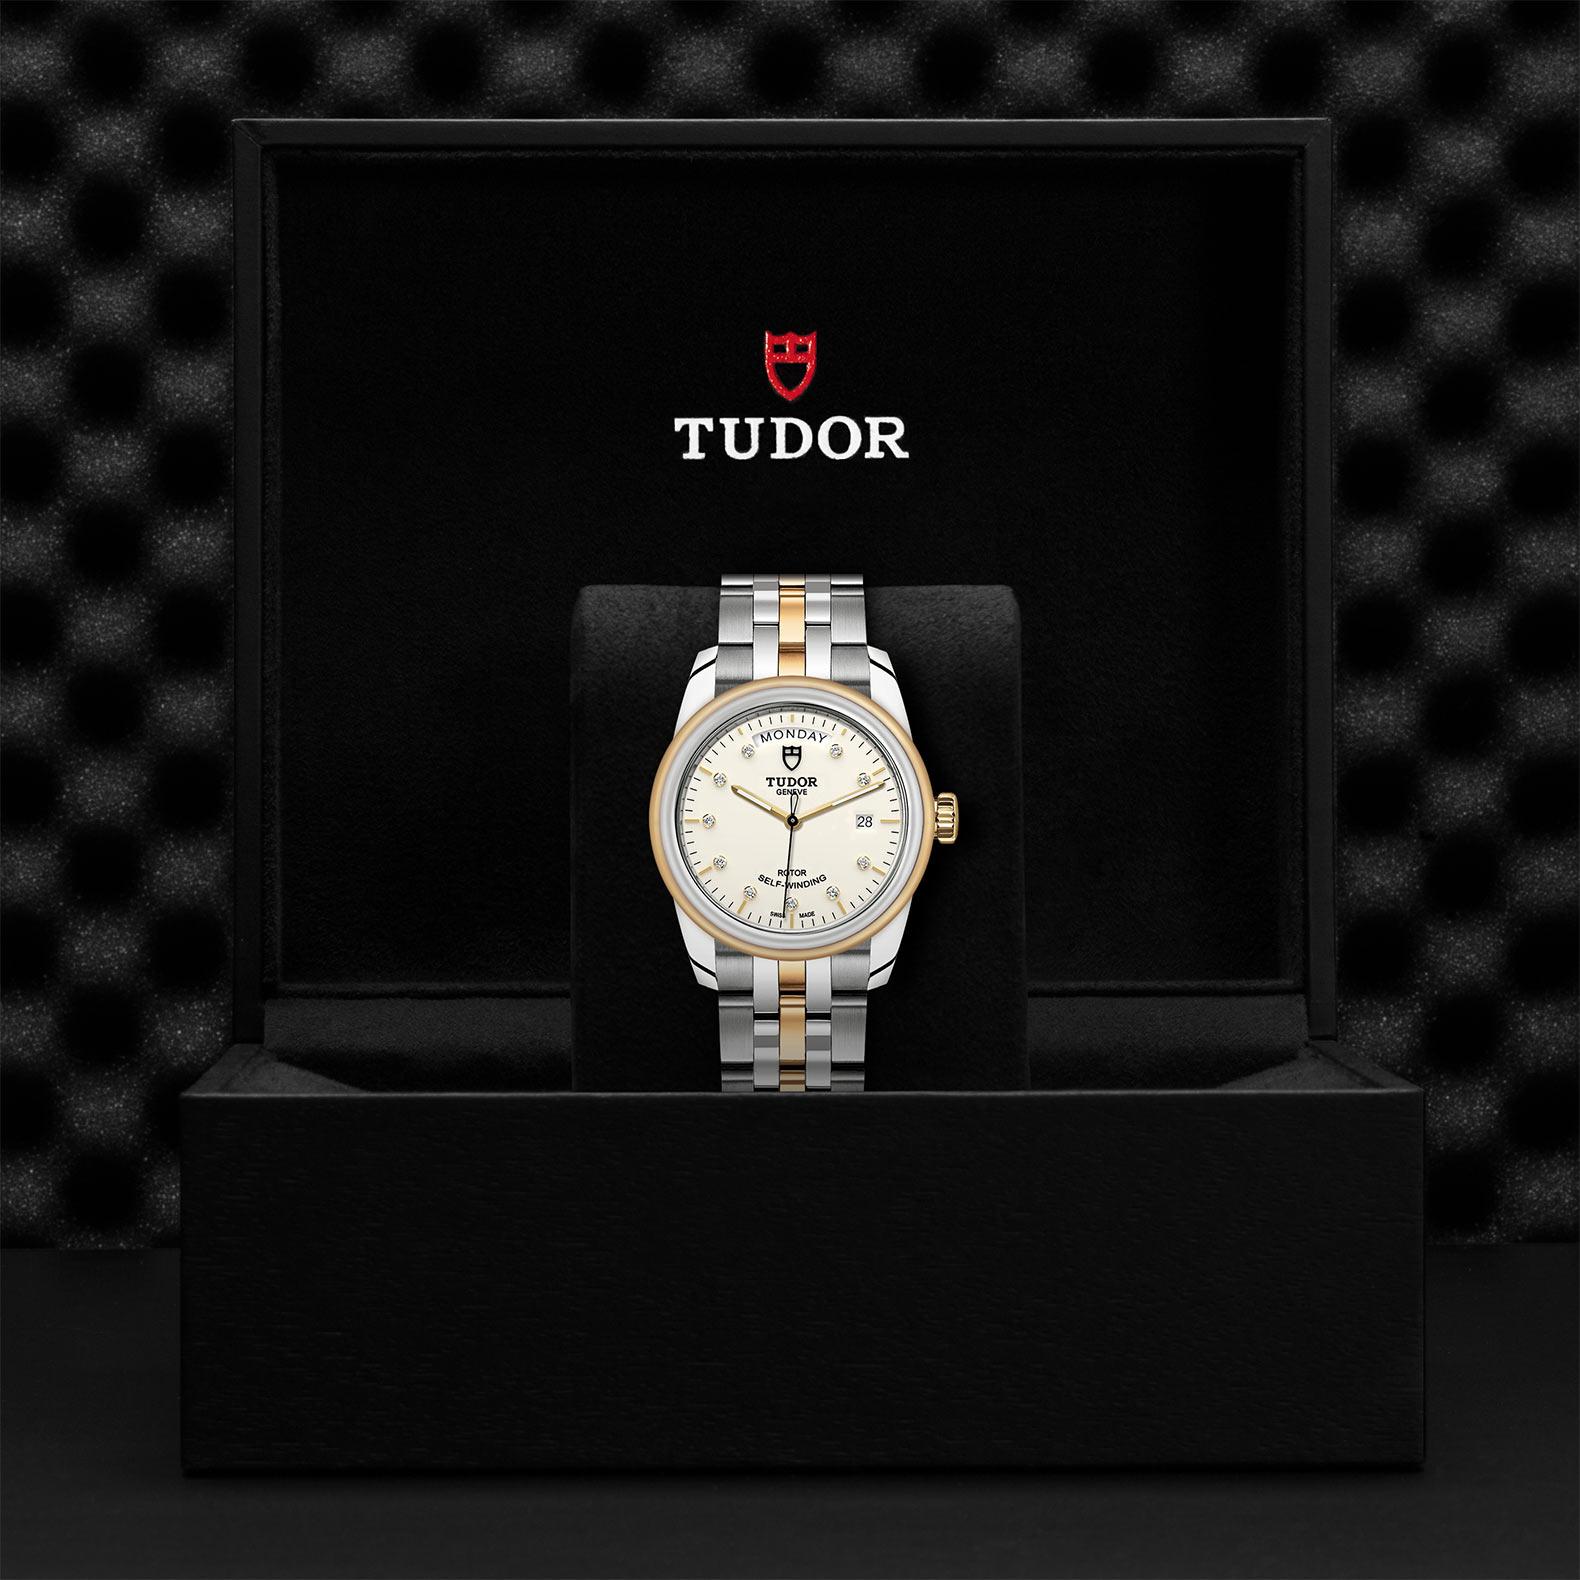 TUDOR Glamour Date Day M56003 0113 Presentationbox